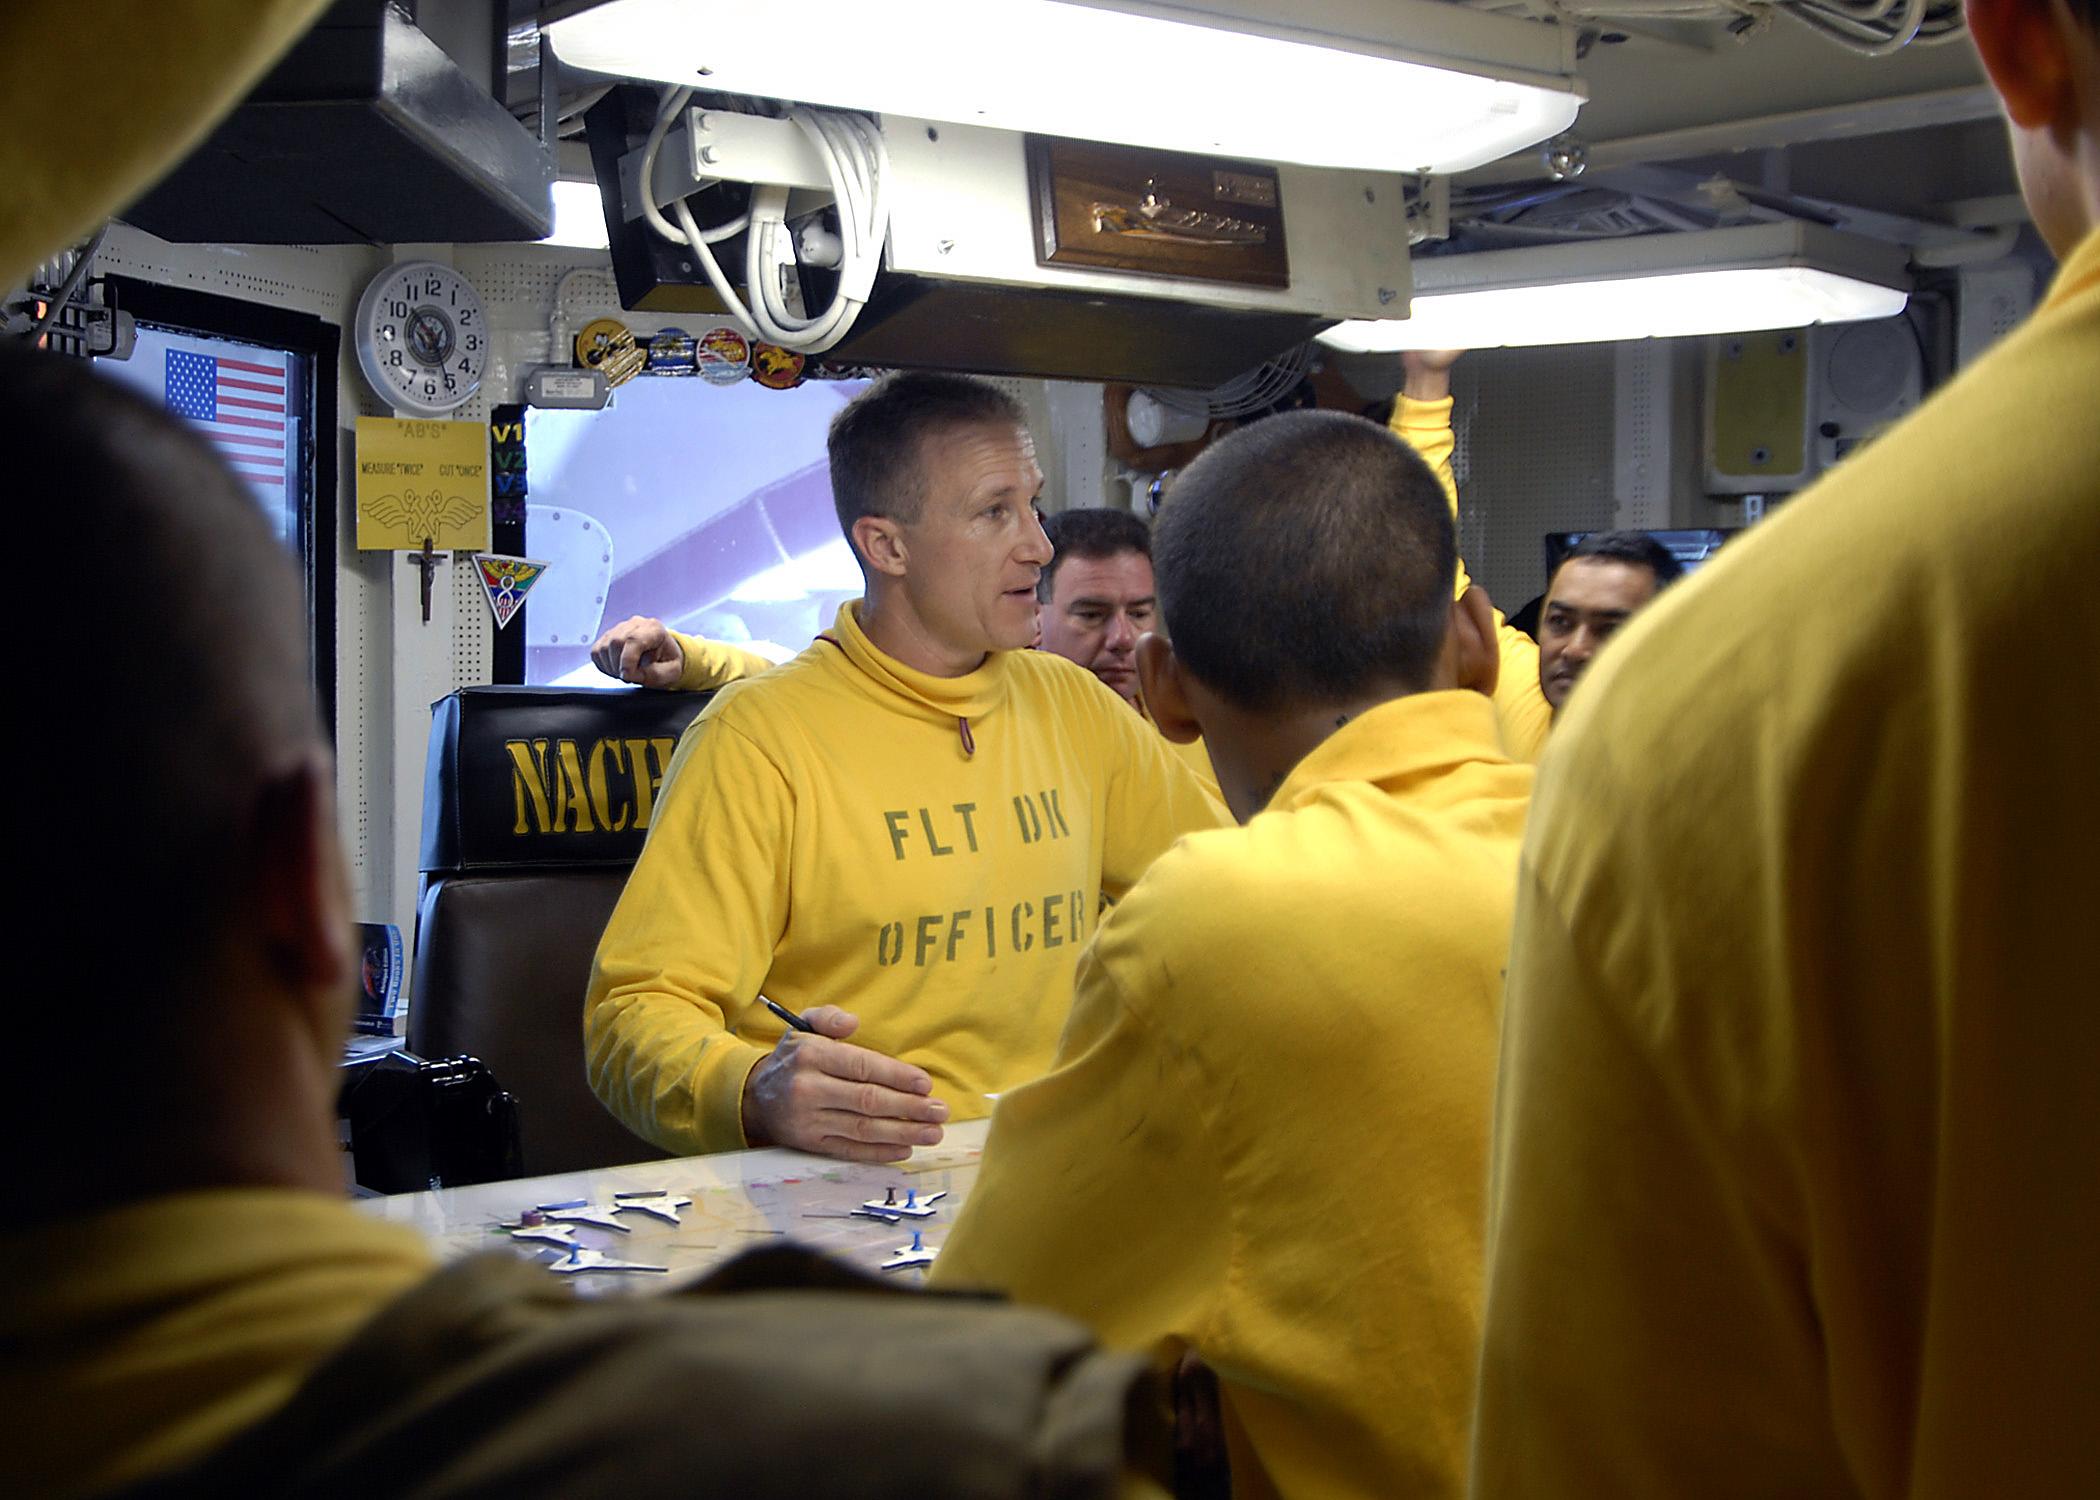 File:US Navy 081018-N-6676S-003 Lt  Ronald Rancourt, flight deck